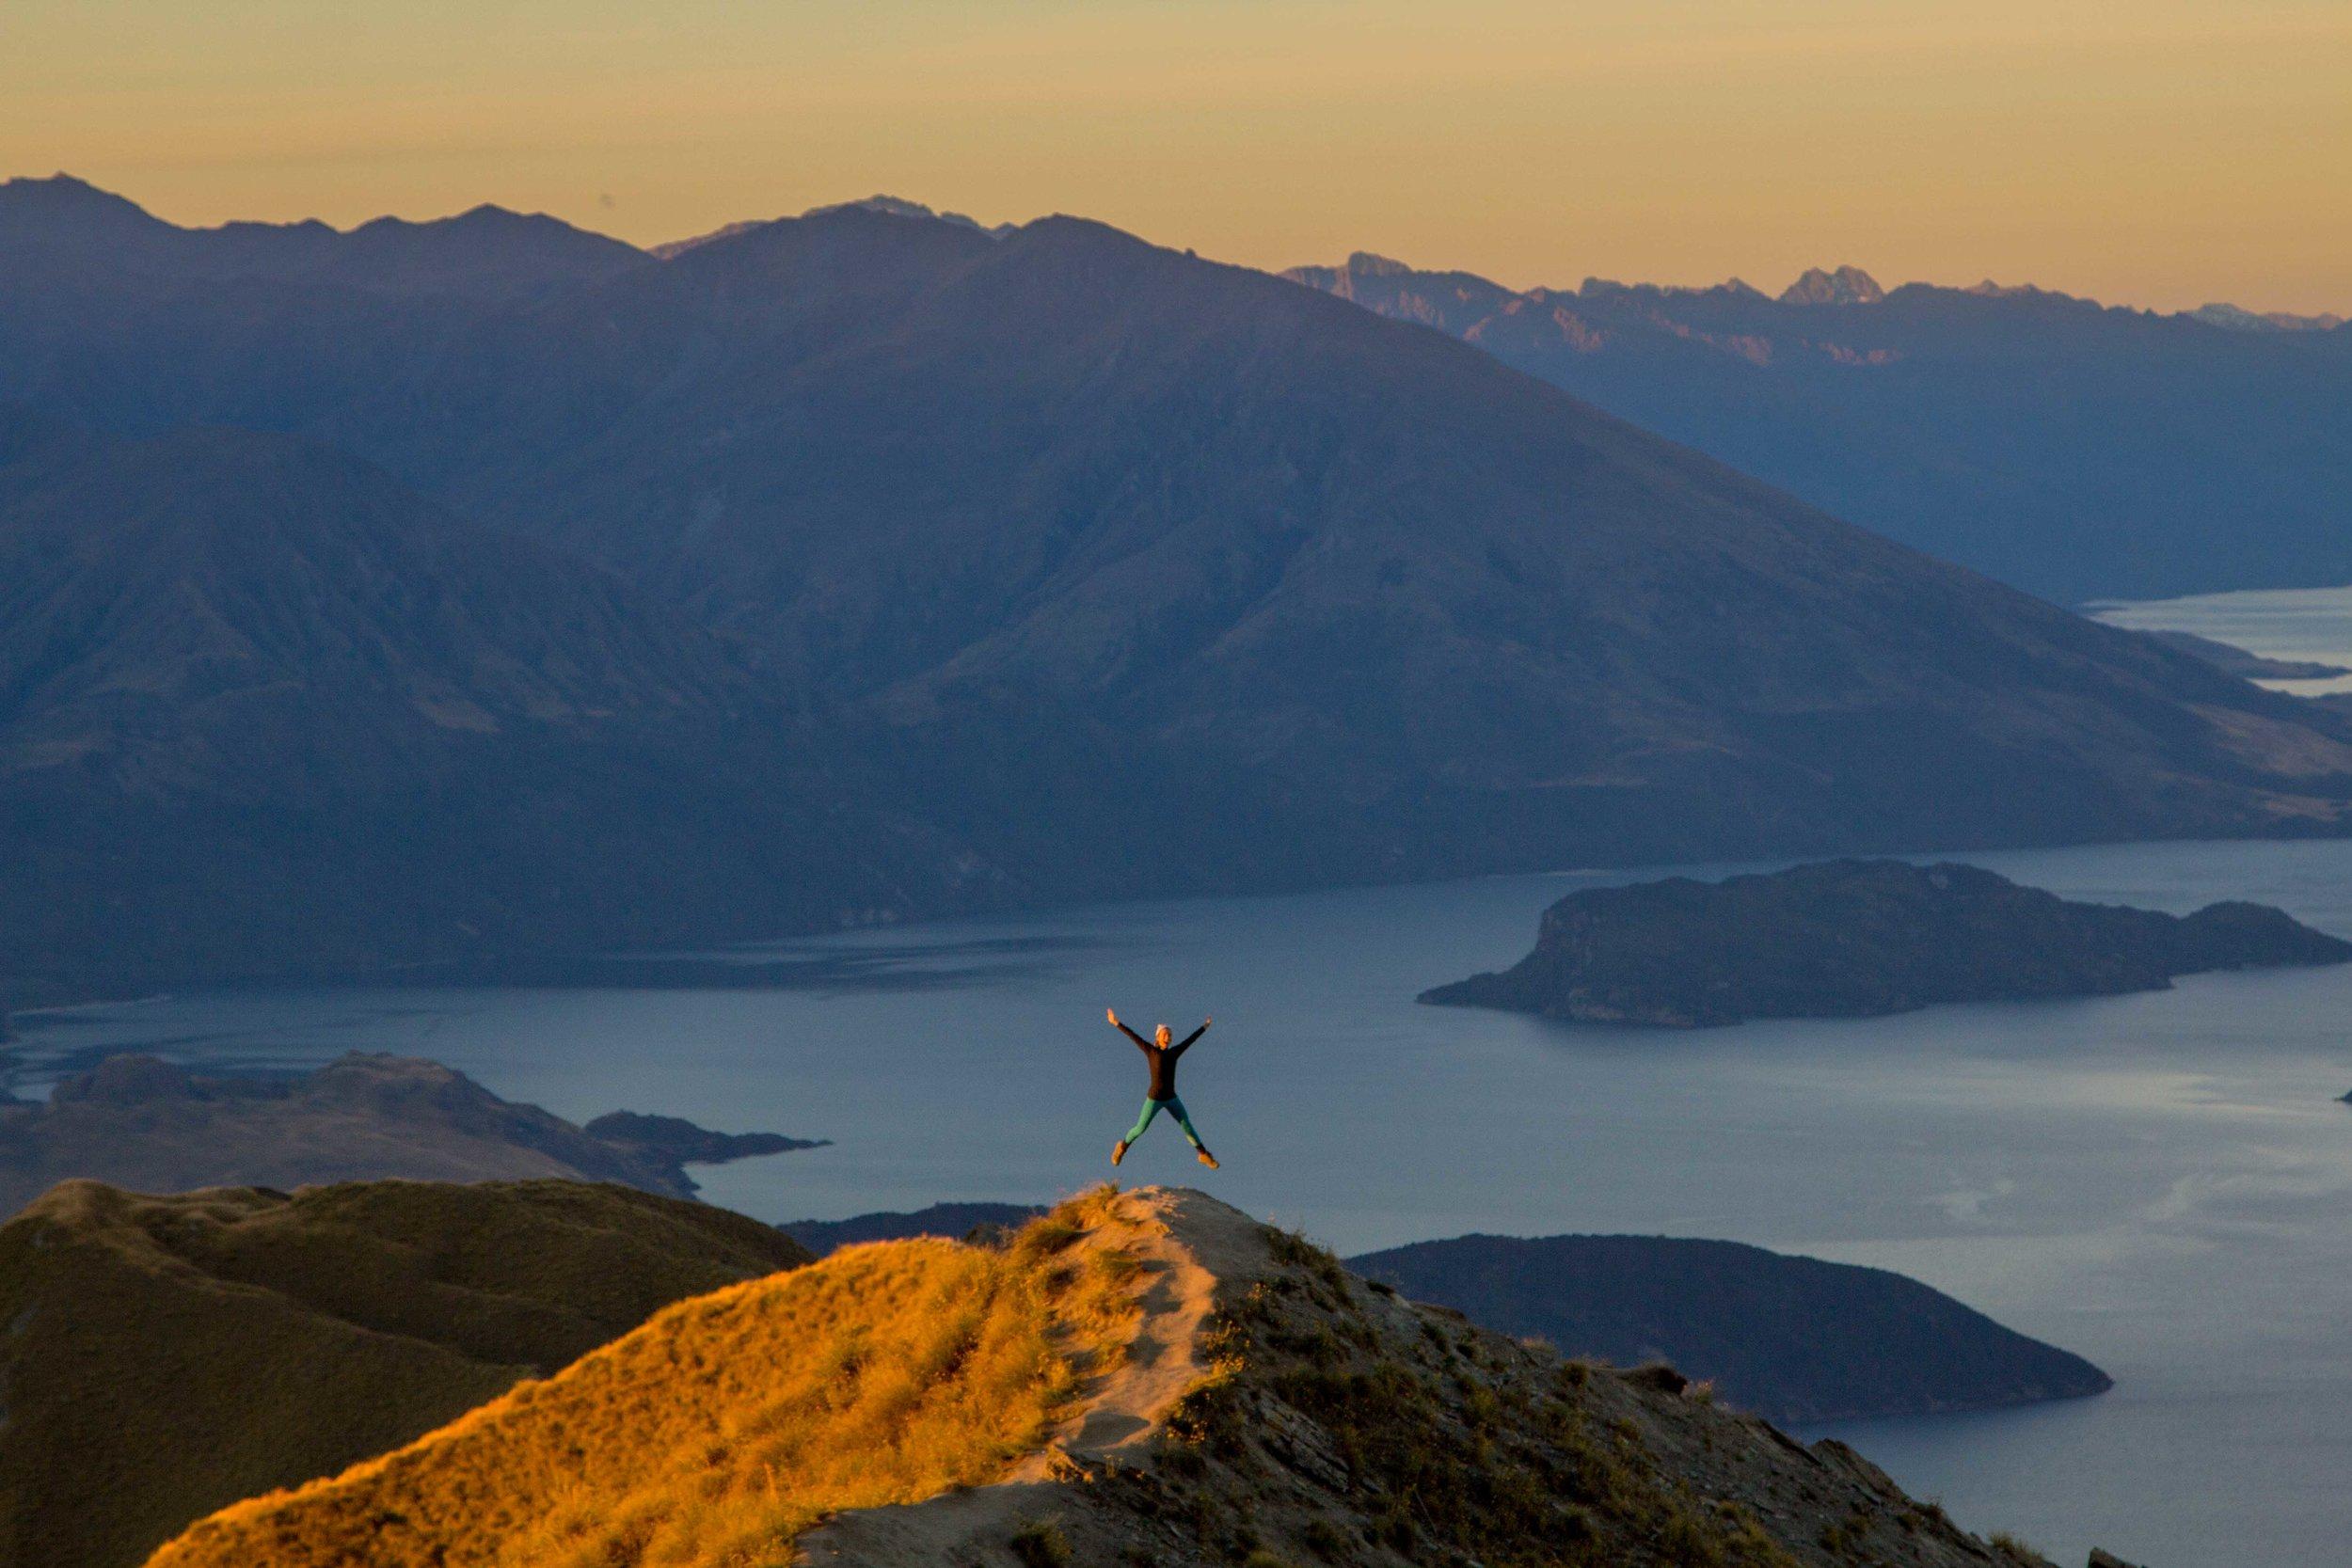 Roys Peak Wanaka New Zealand Camping (3 of 6).jpg